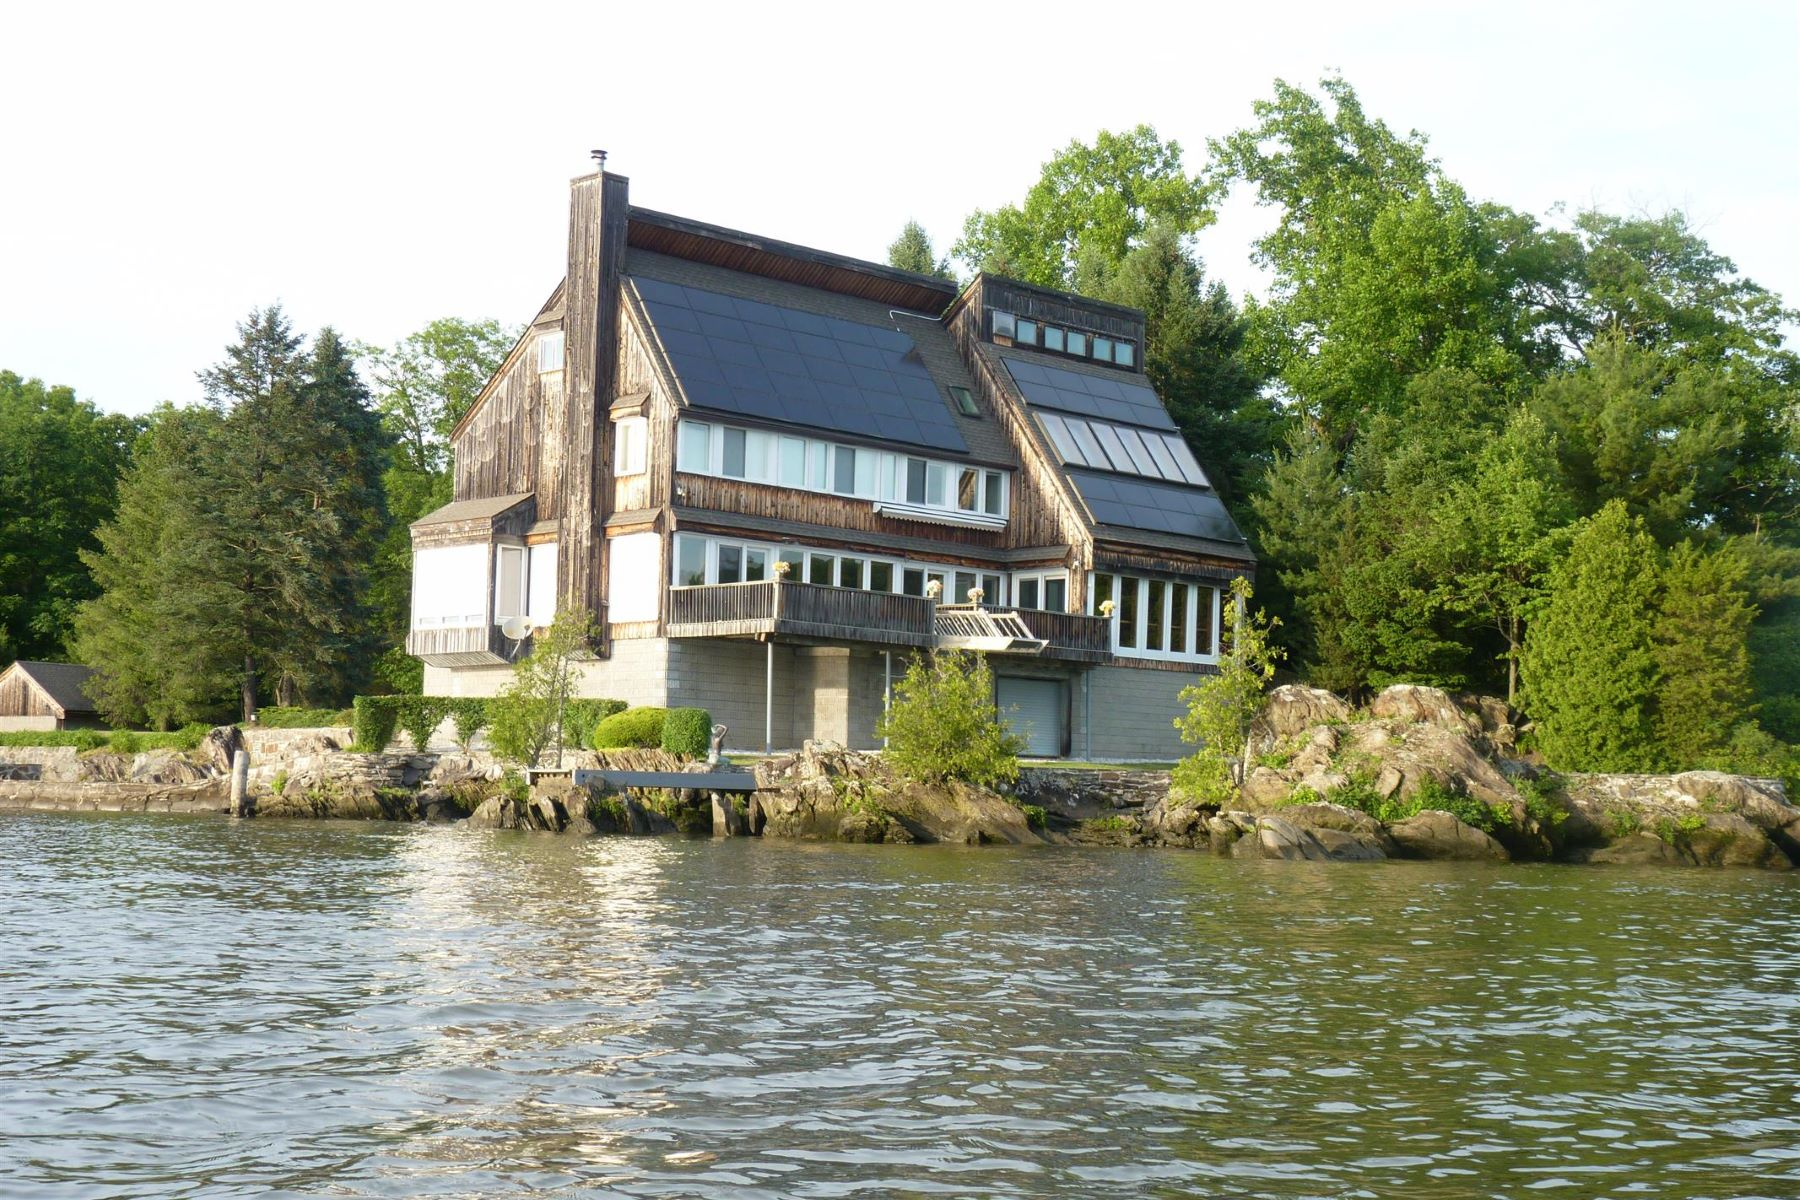 独户住宅 为 销售 在 Bolles Island on the Hudson River 16 Poppinga Lane Hyde Park, 纽约州 12538 美国